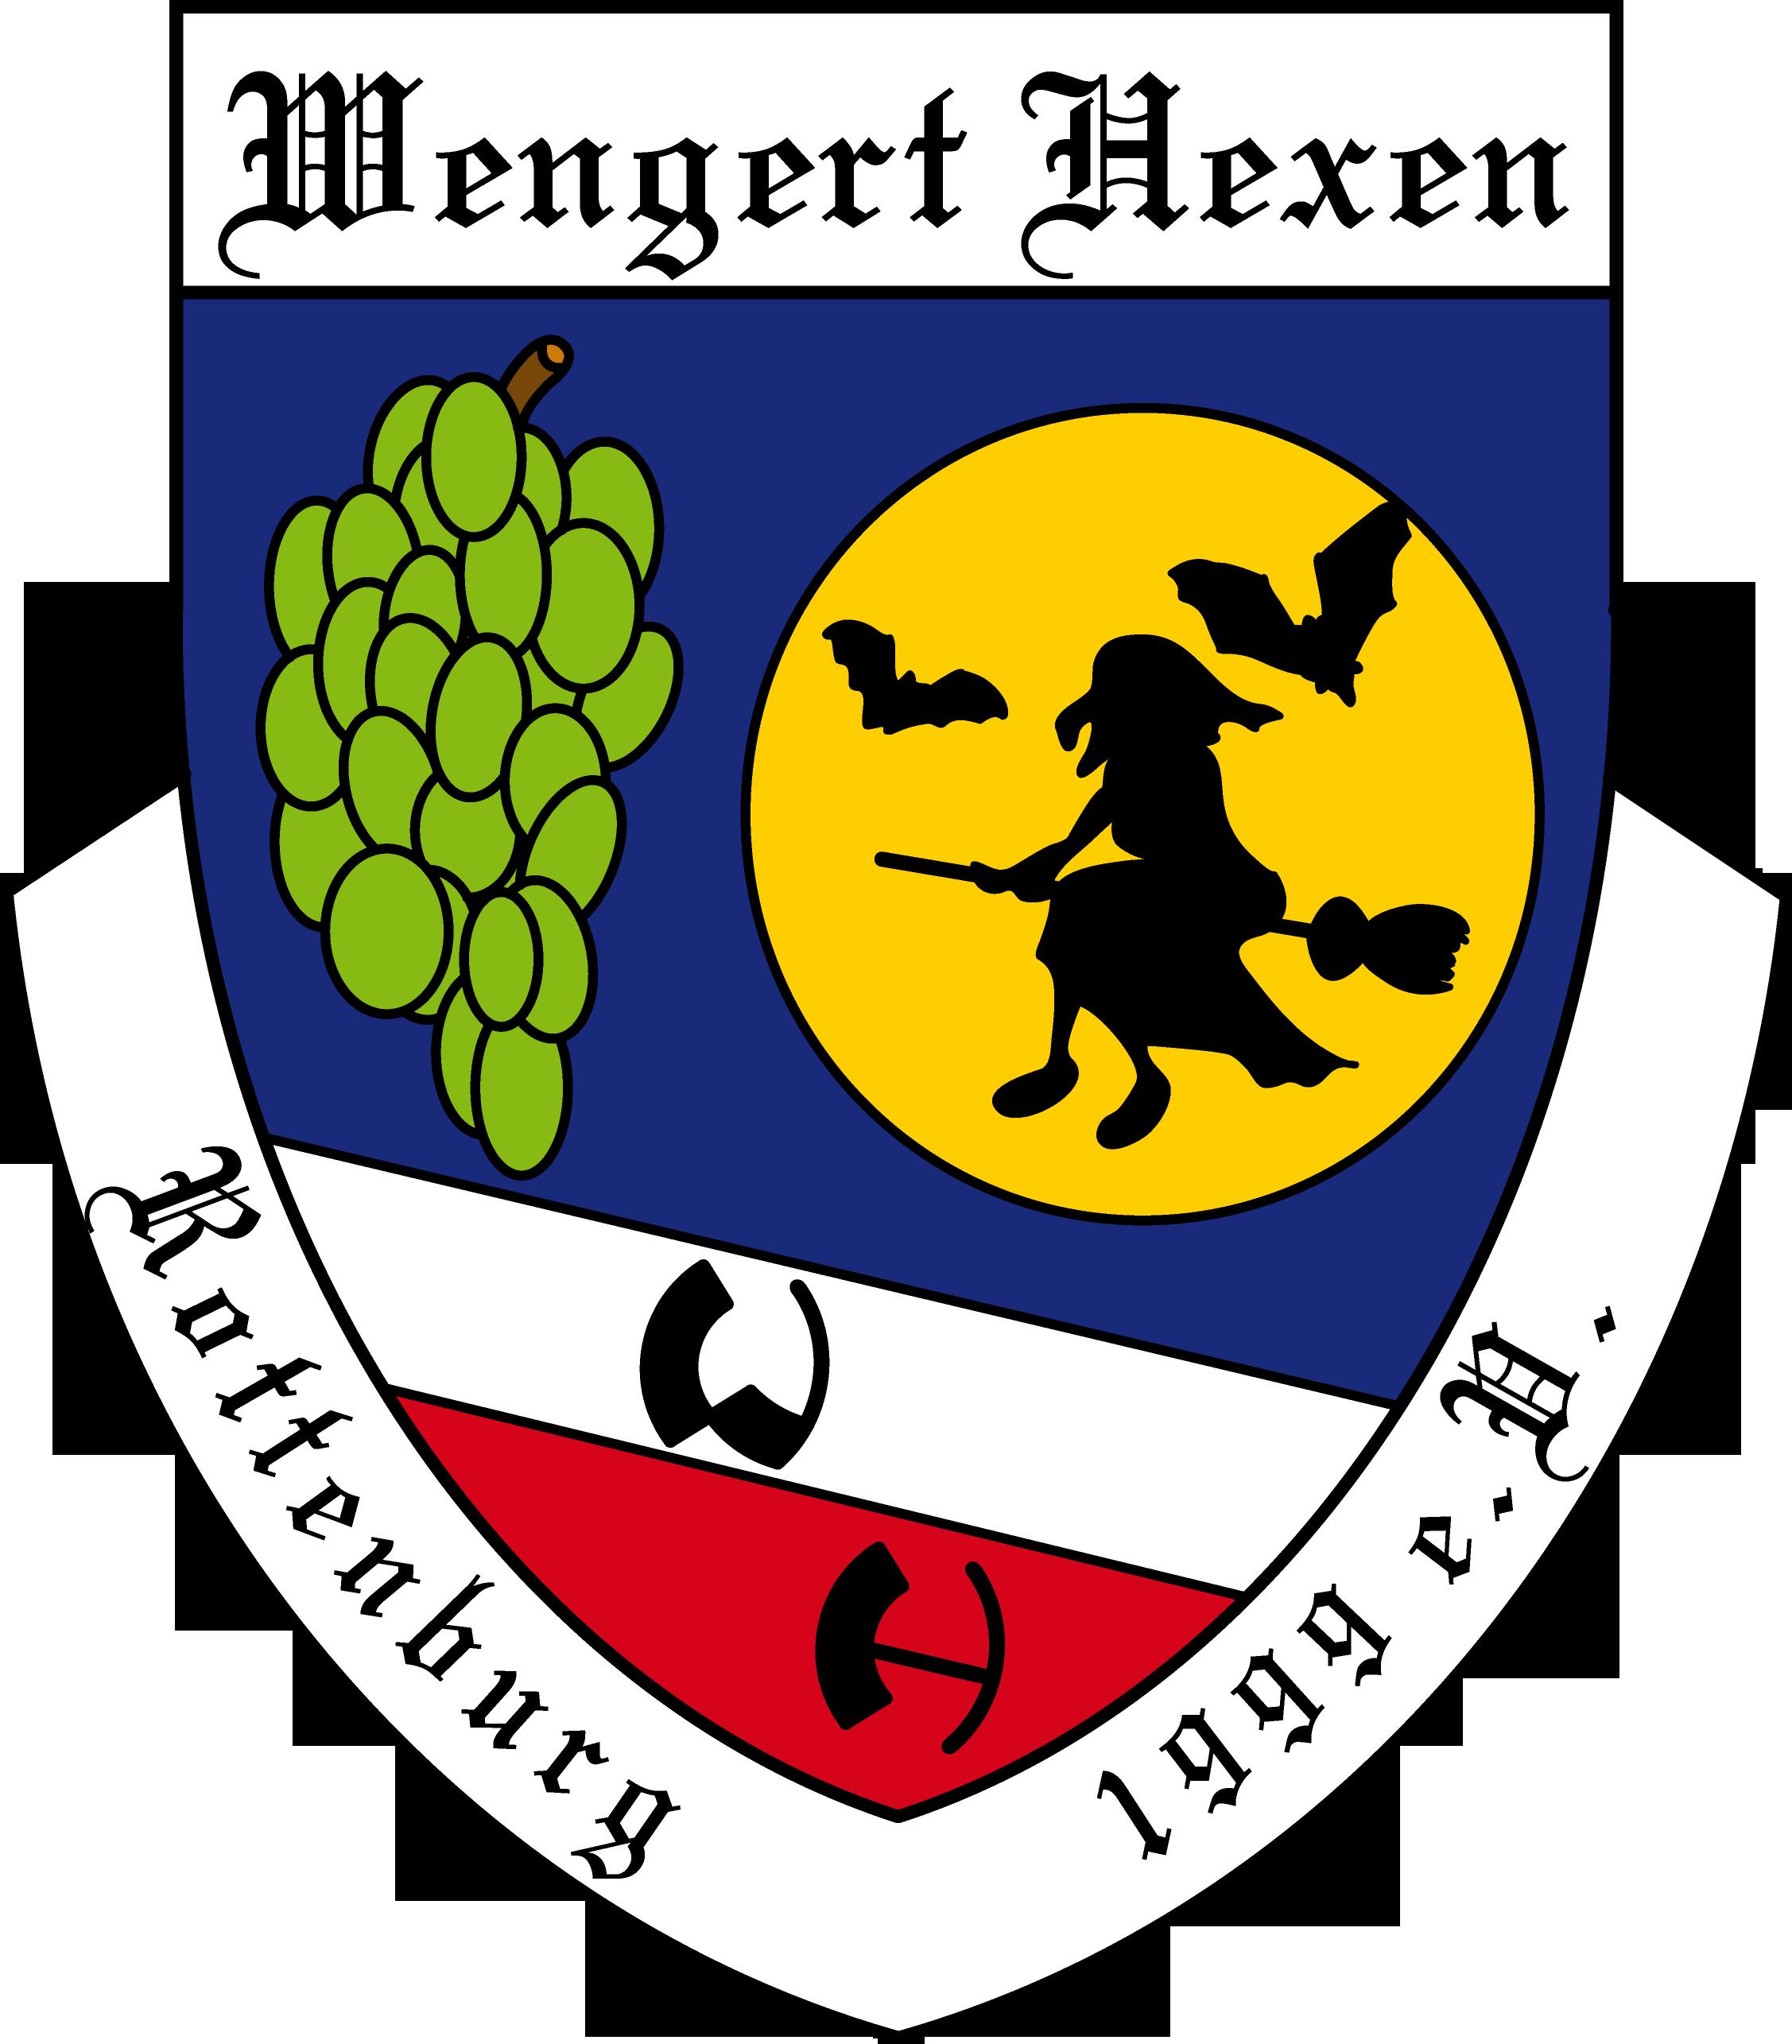 Wengert Hexen 1999 e.V.